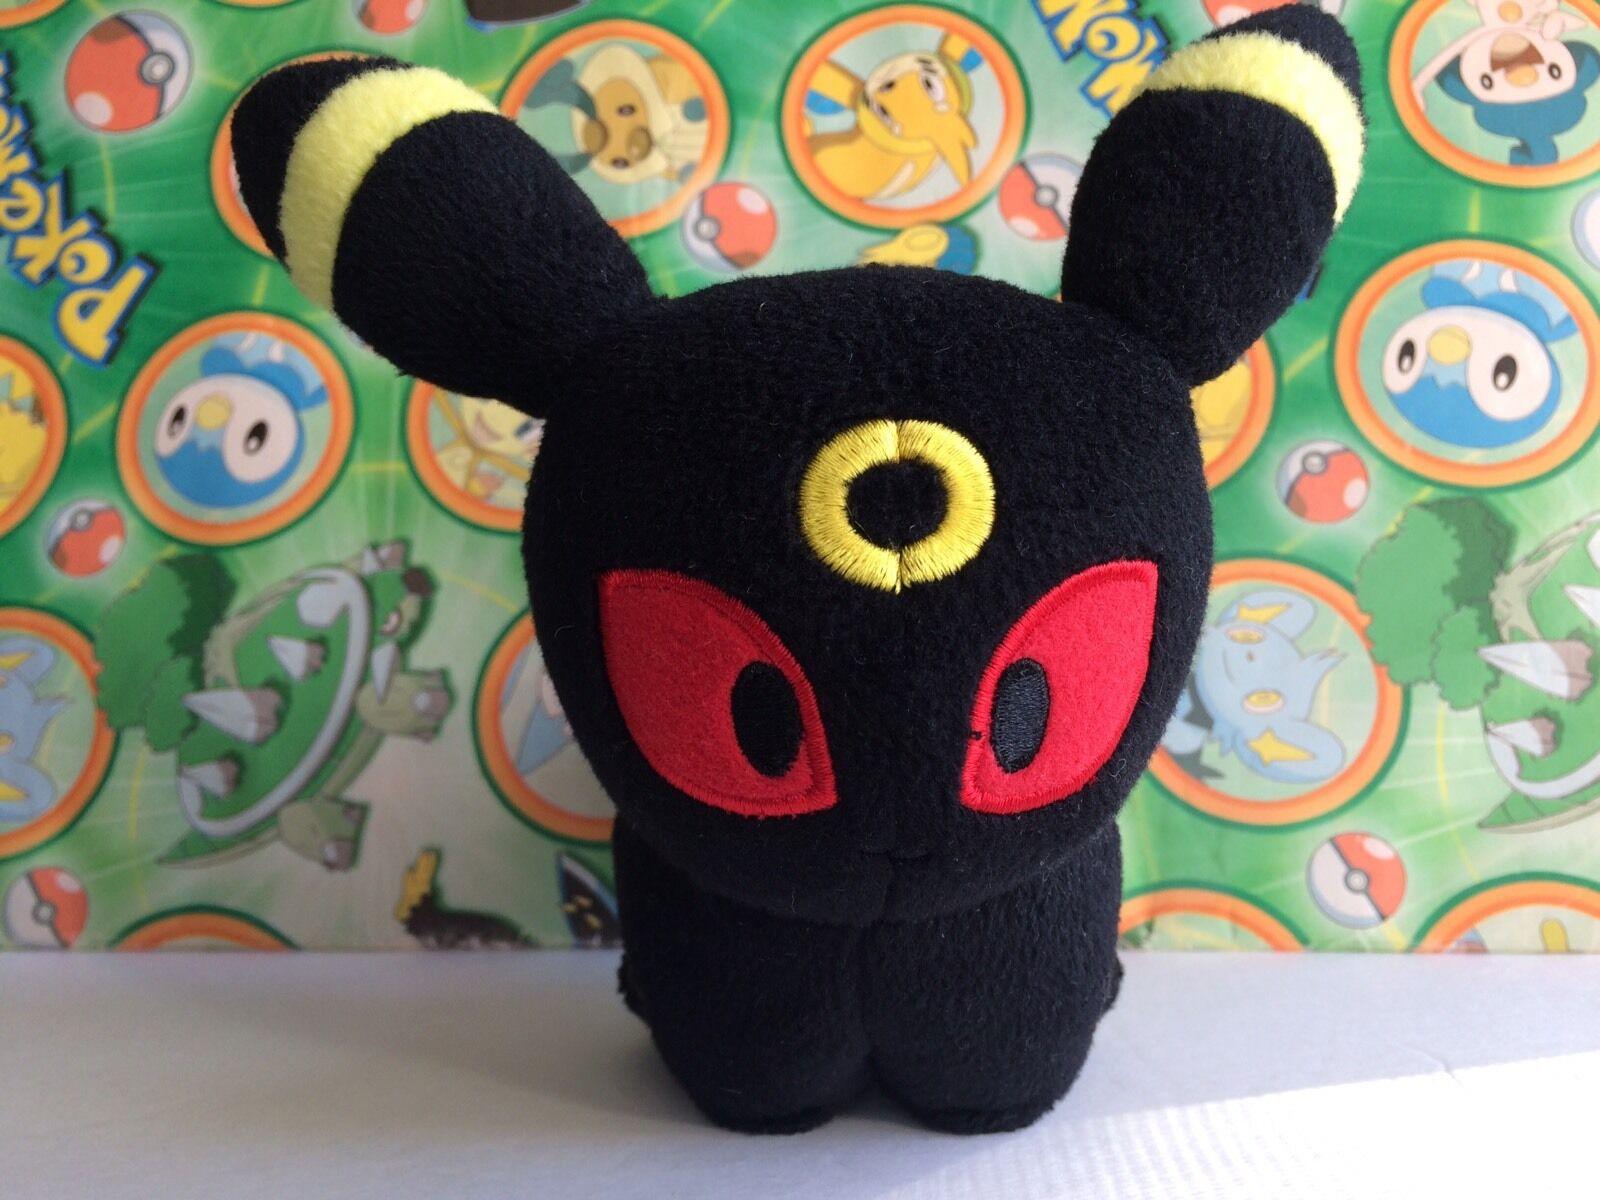 Pokemon Center Plush Pokedoll Umbreon Doll stuffed Animal figure Toy USA Seller